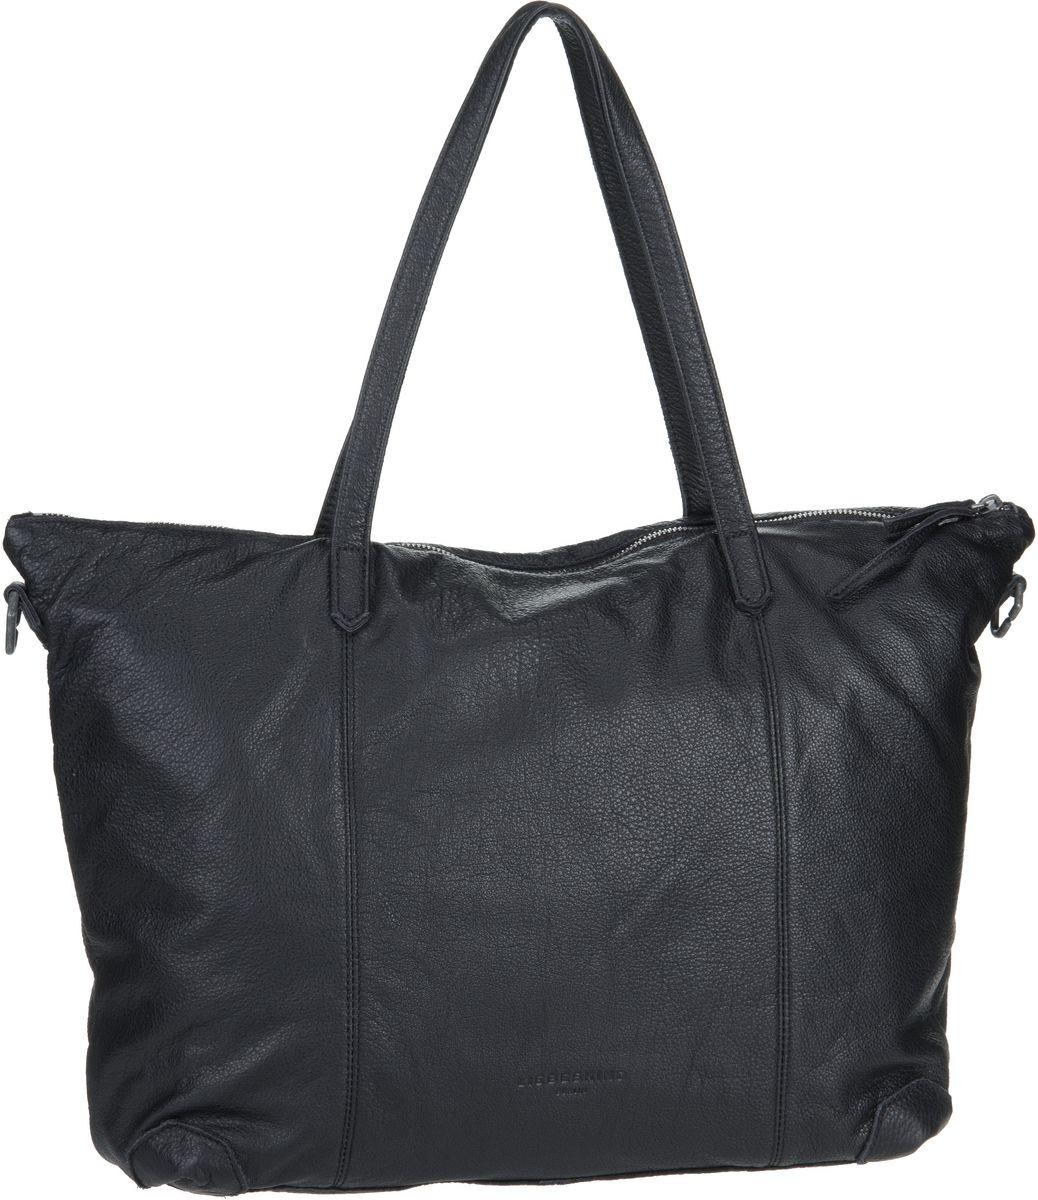 Berlin Handtasche Kaethe C7 Vintage Black